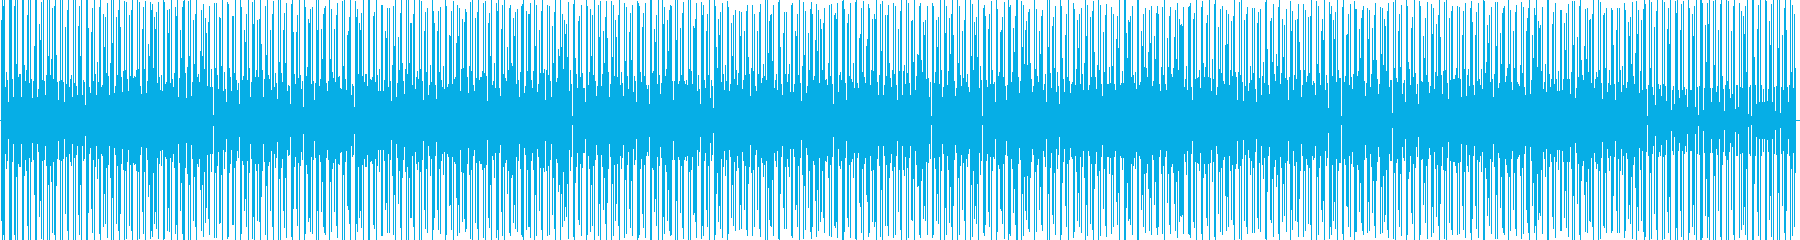 Jazzyテイストのヒップホップトラックの再生済みの波形